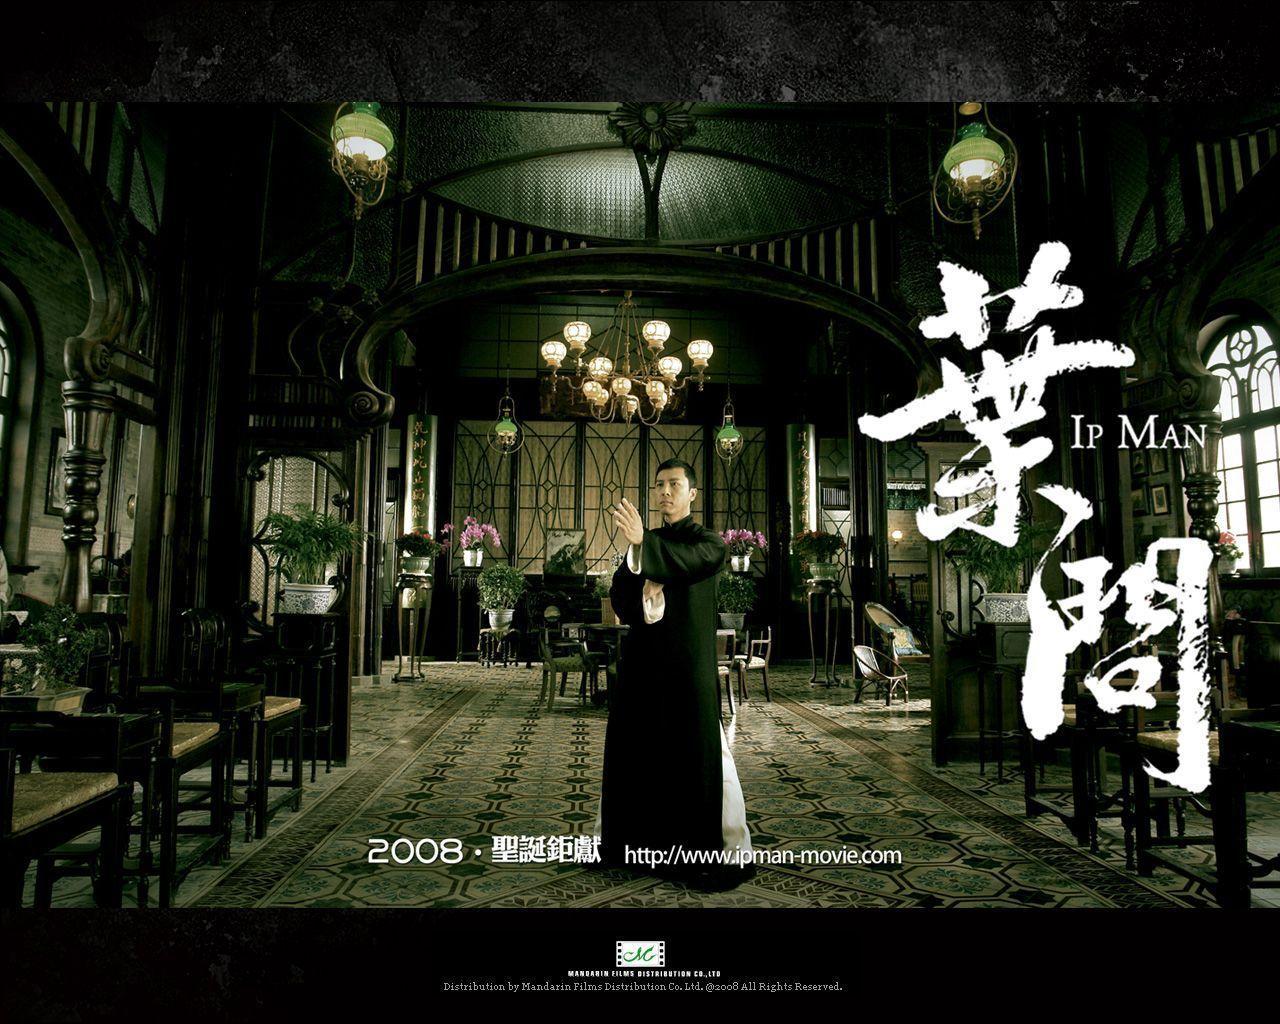 Wing Chun Hd Wallpapers Wallpaper Cave